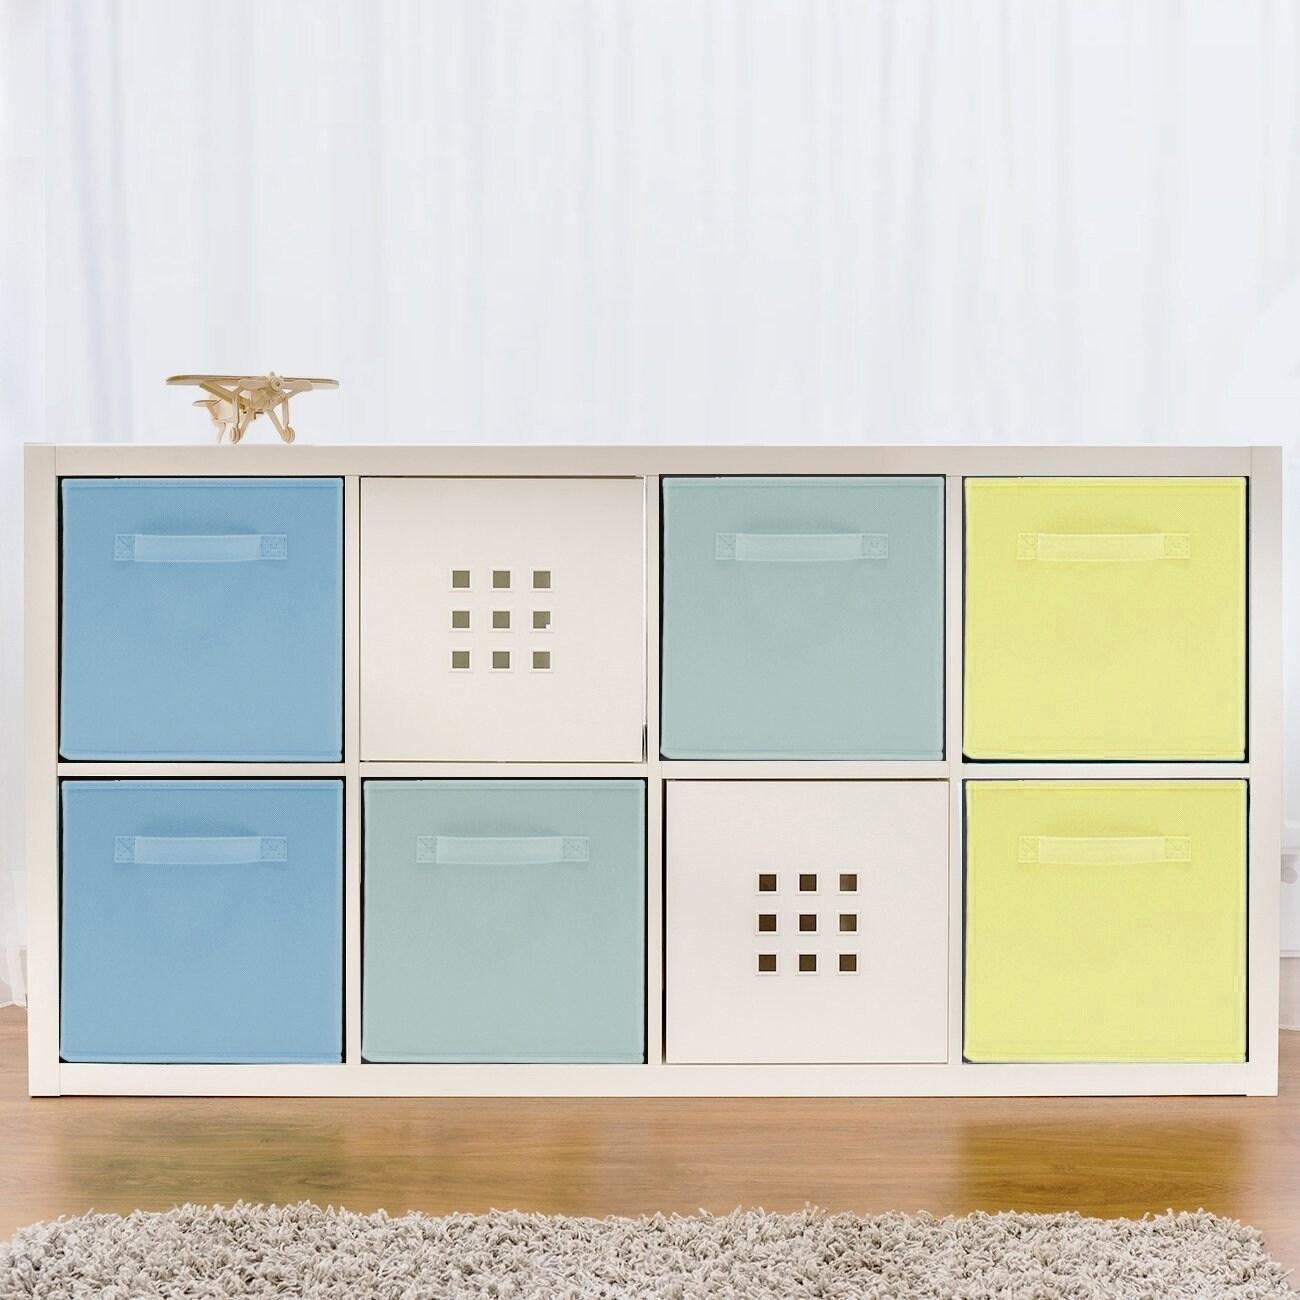 Home Storage Bundle Pastel Drawer and Closet Bins Blue Green Yellow 6 Pack 11d3af56 0556 45f2 89e8 cc5501a1bb5b